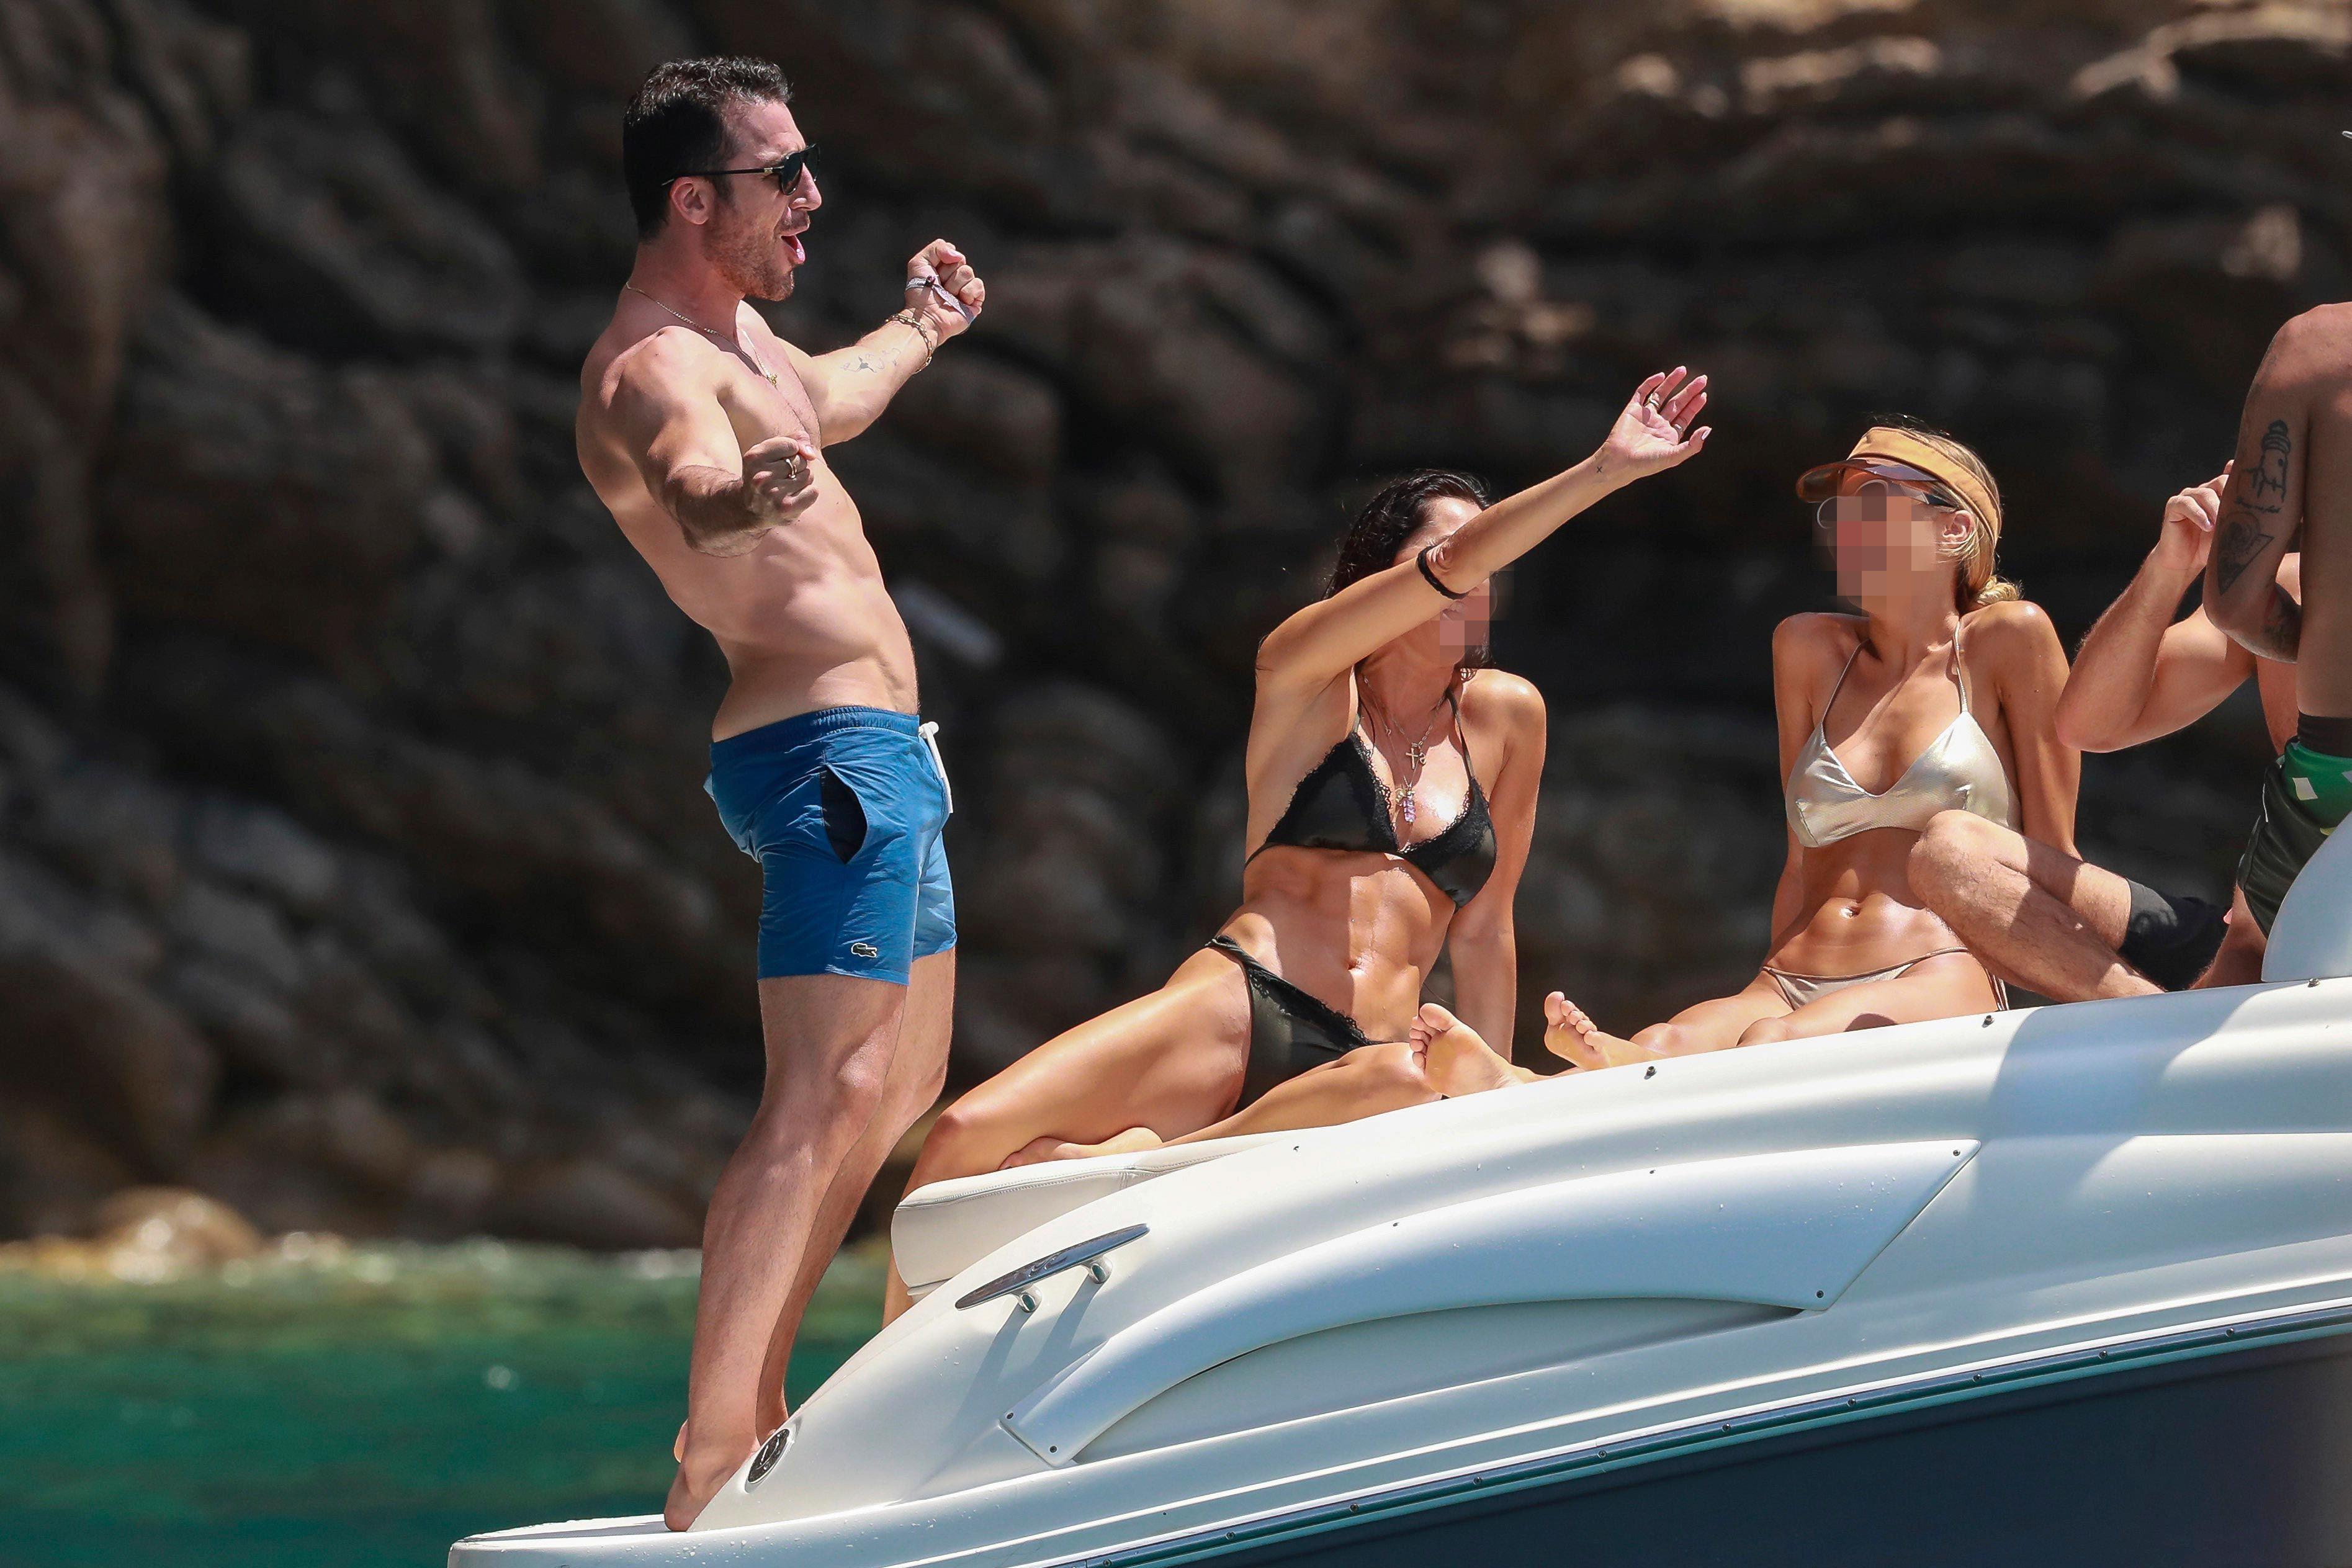 Miguel Ángel Silvestre luce cuerpazo en Ibiza